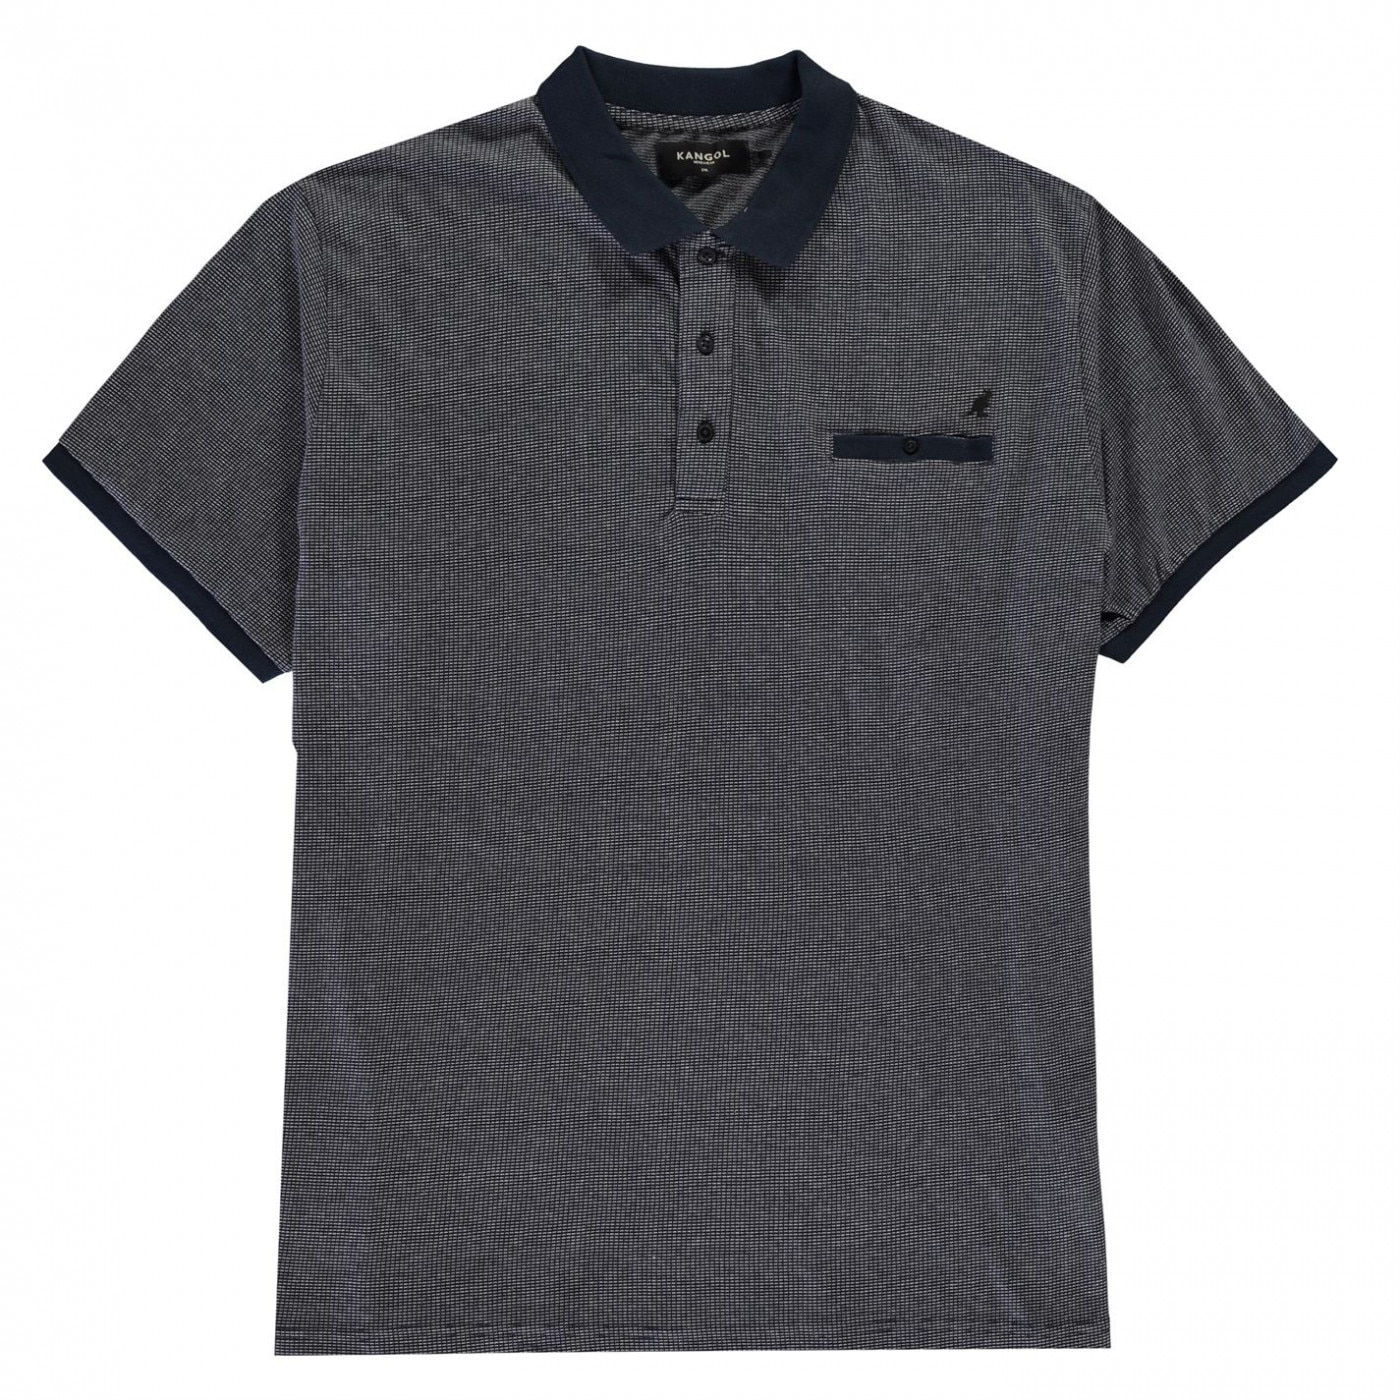 Kangol XL Huxley Polo Shirt Mens